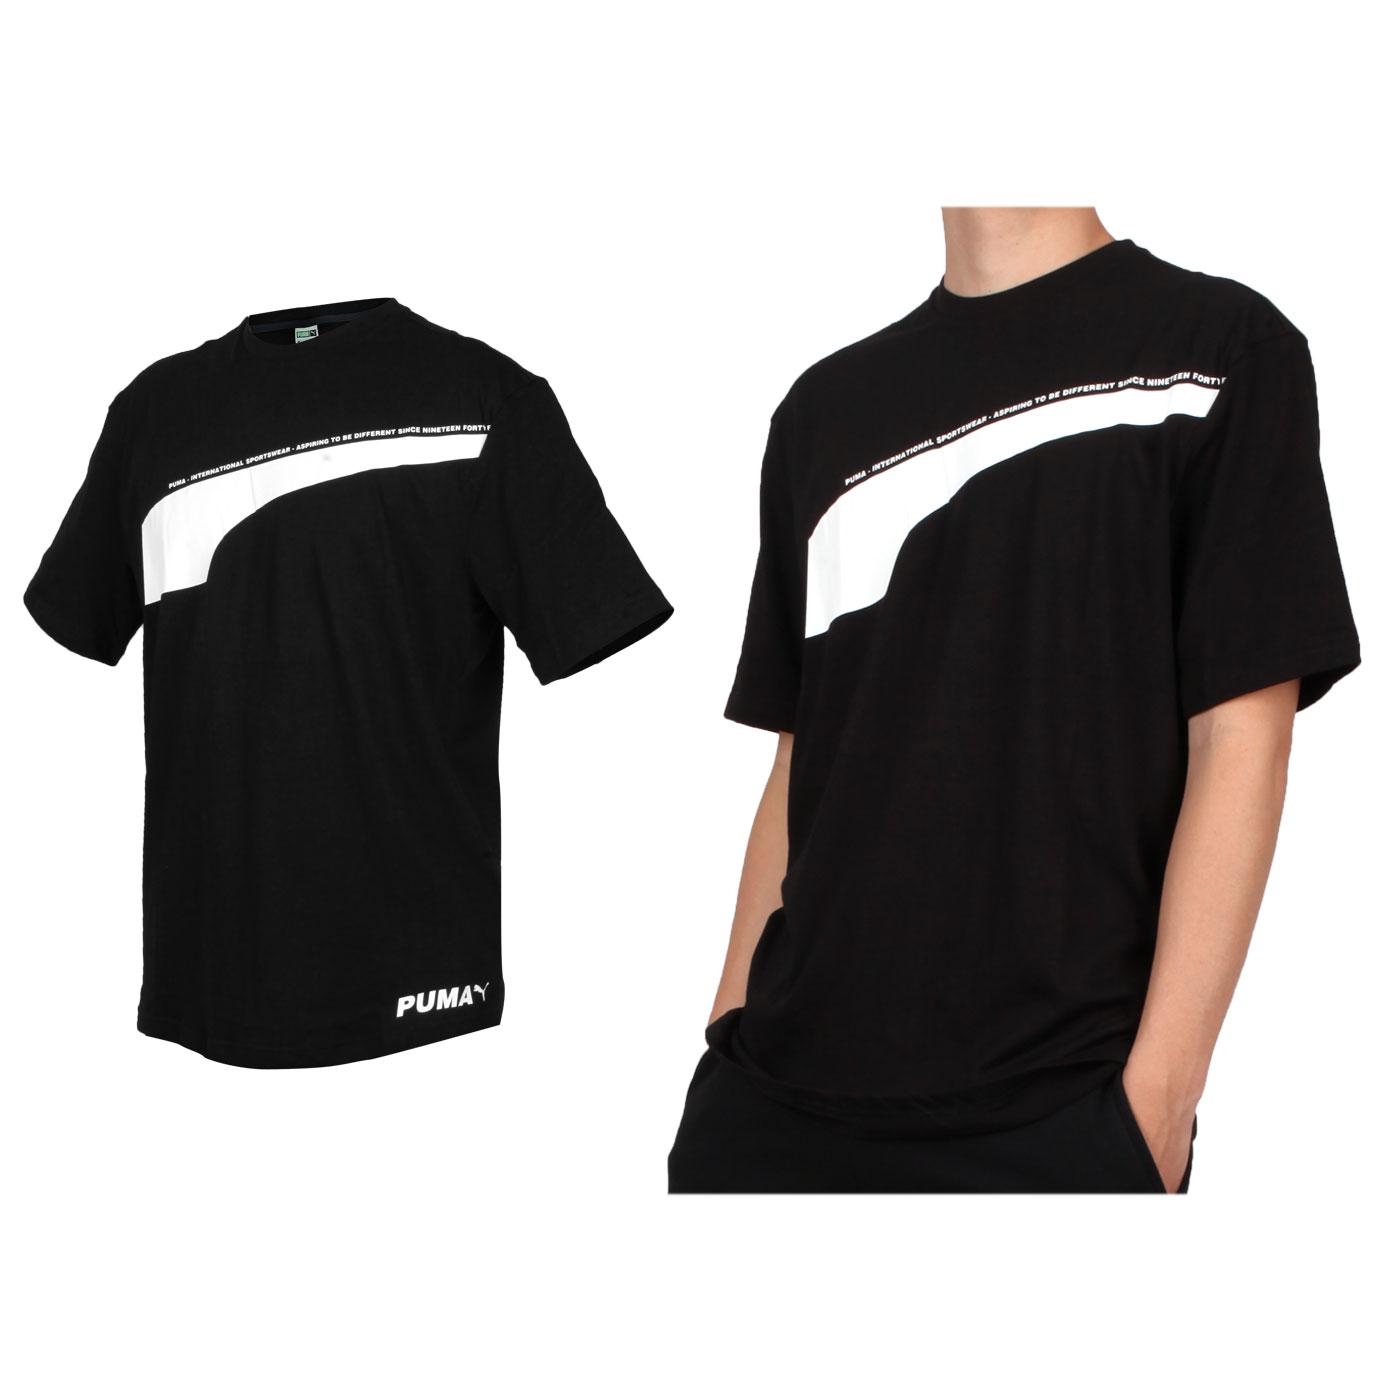 PUMA 男款流行系列Avenir短袖T恤 59645701 - 黑白